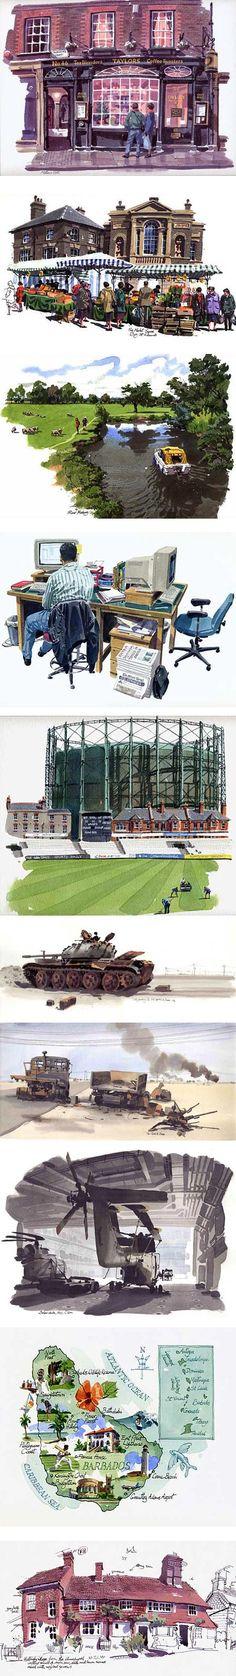 UK illustrator Matthew Cook